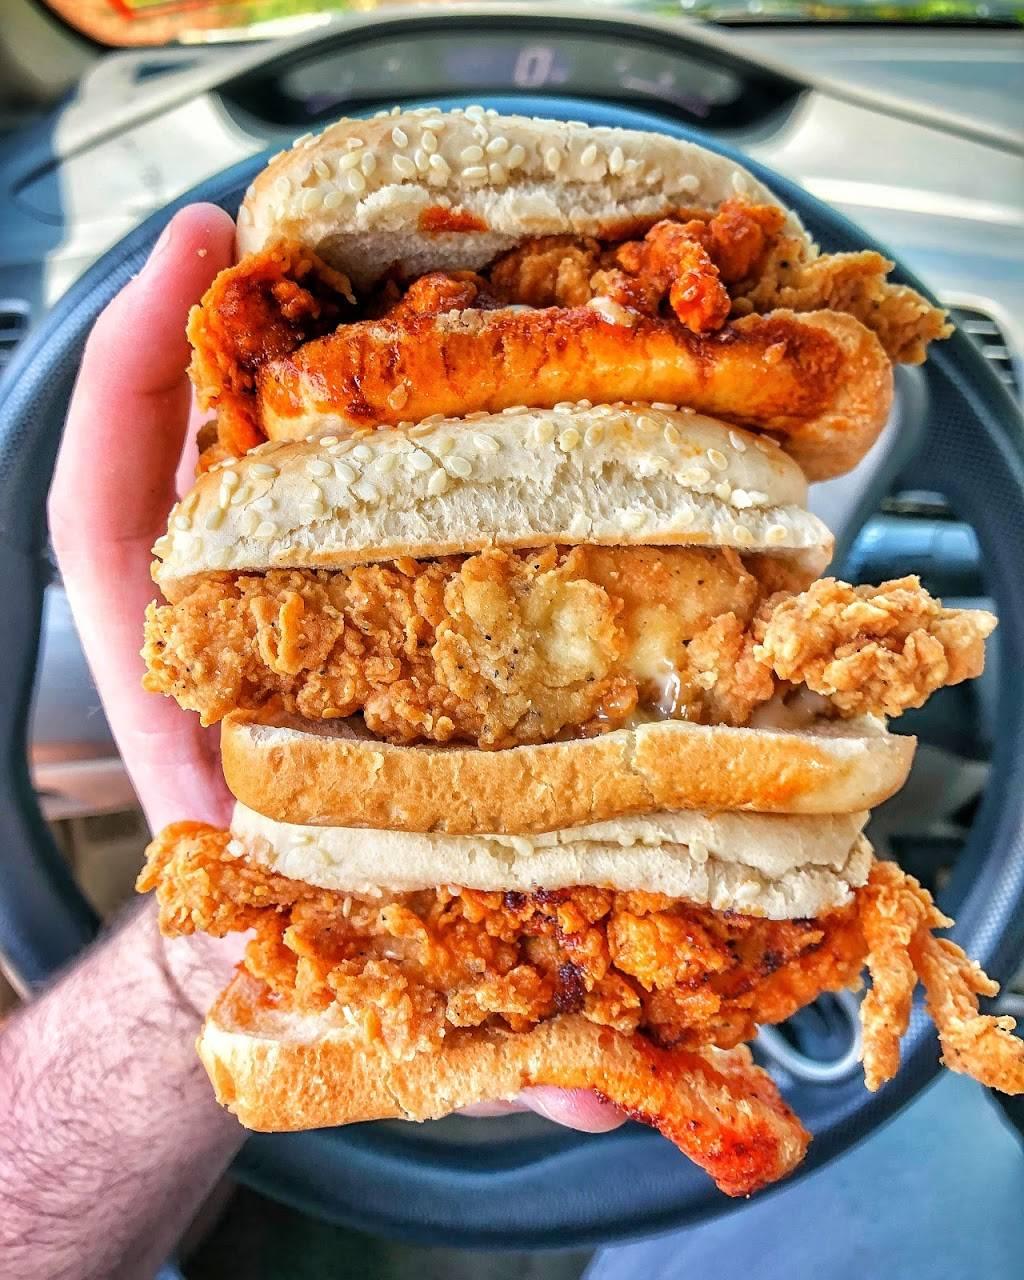 KFC   restaurant   177 NJ-17, Hasbrouck Heights, NJ 07604, USA   2014260380 OR +1 201-426-0380